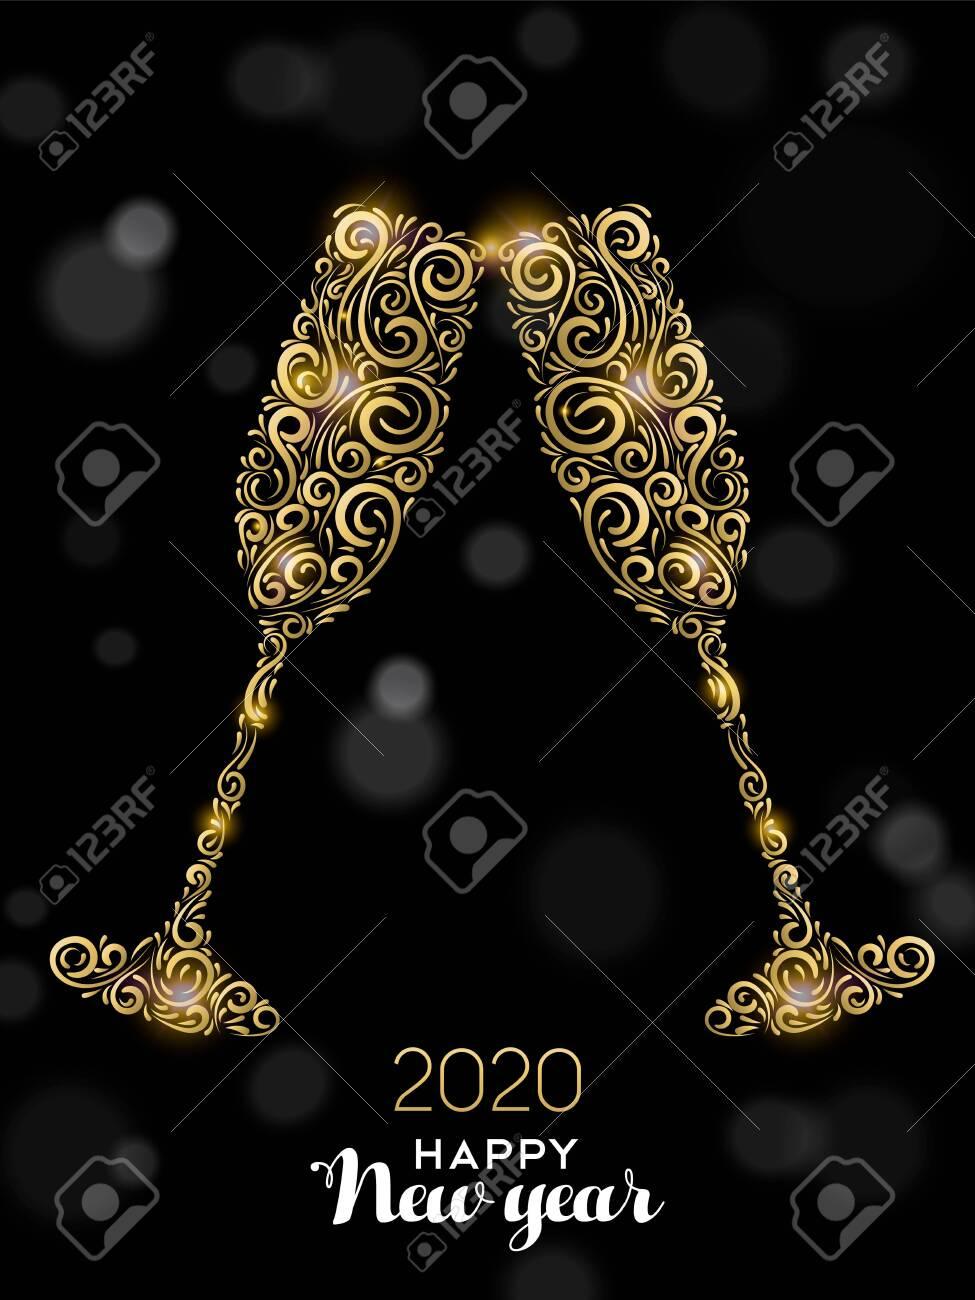 Happy New Year 2020 greeting card illustration. Luxury gold glass drinks making celebration toast on black background for elegant holiday event. - 130839032